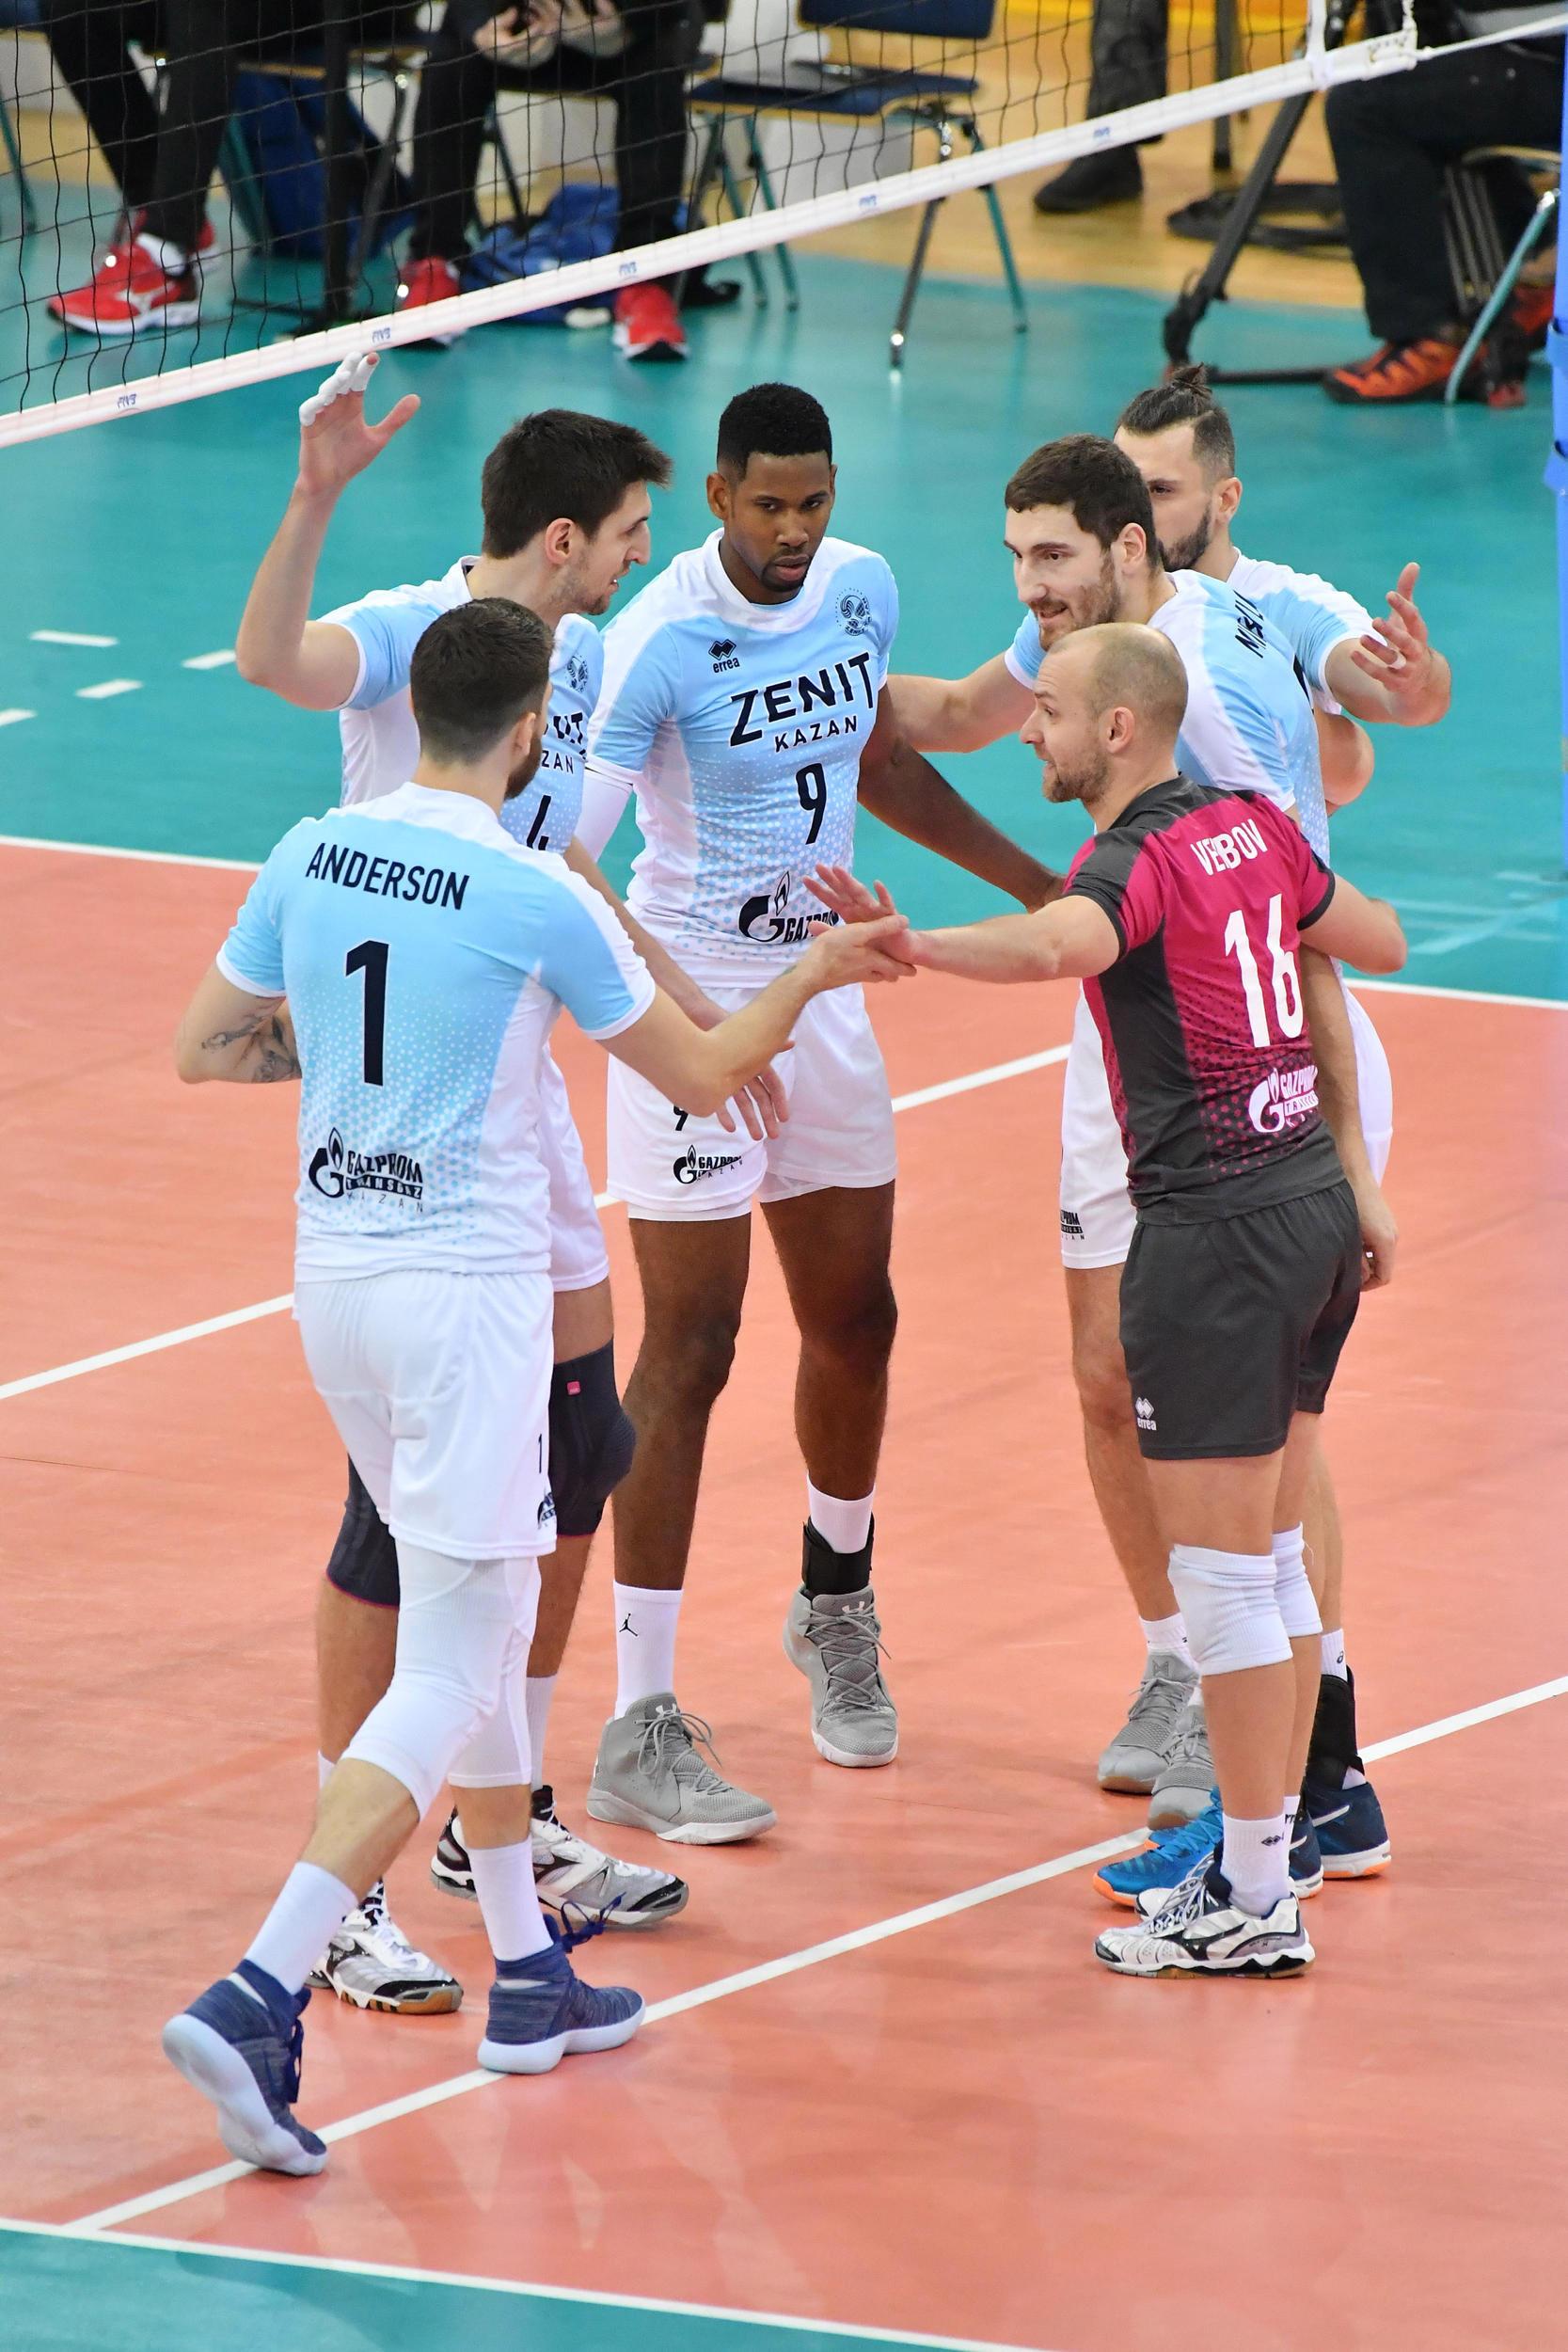 Post Match Zenit Kazan Bolivar Fivb Volleyball Men S Club World Championship 2017